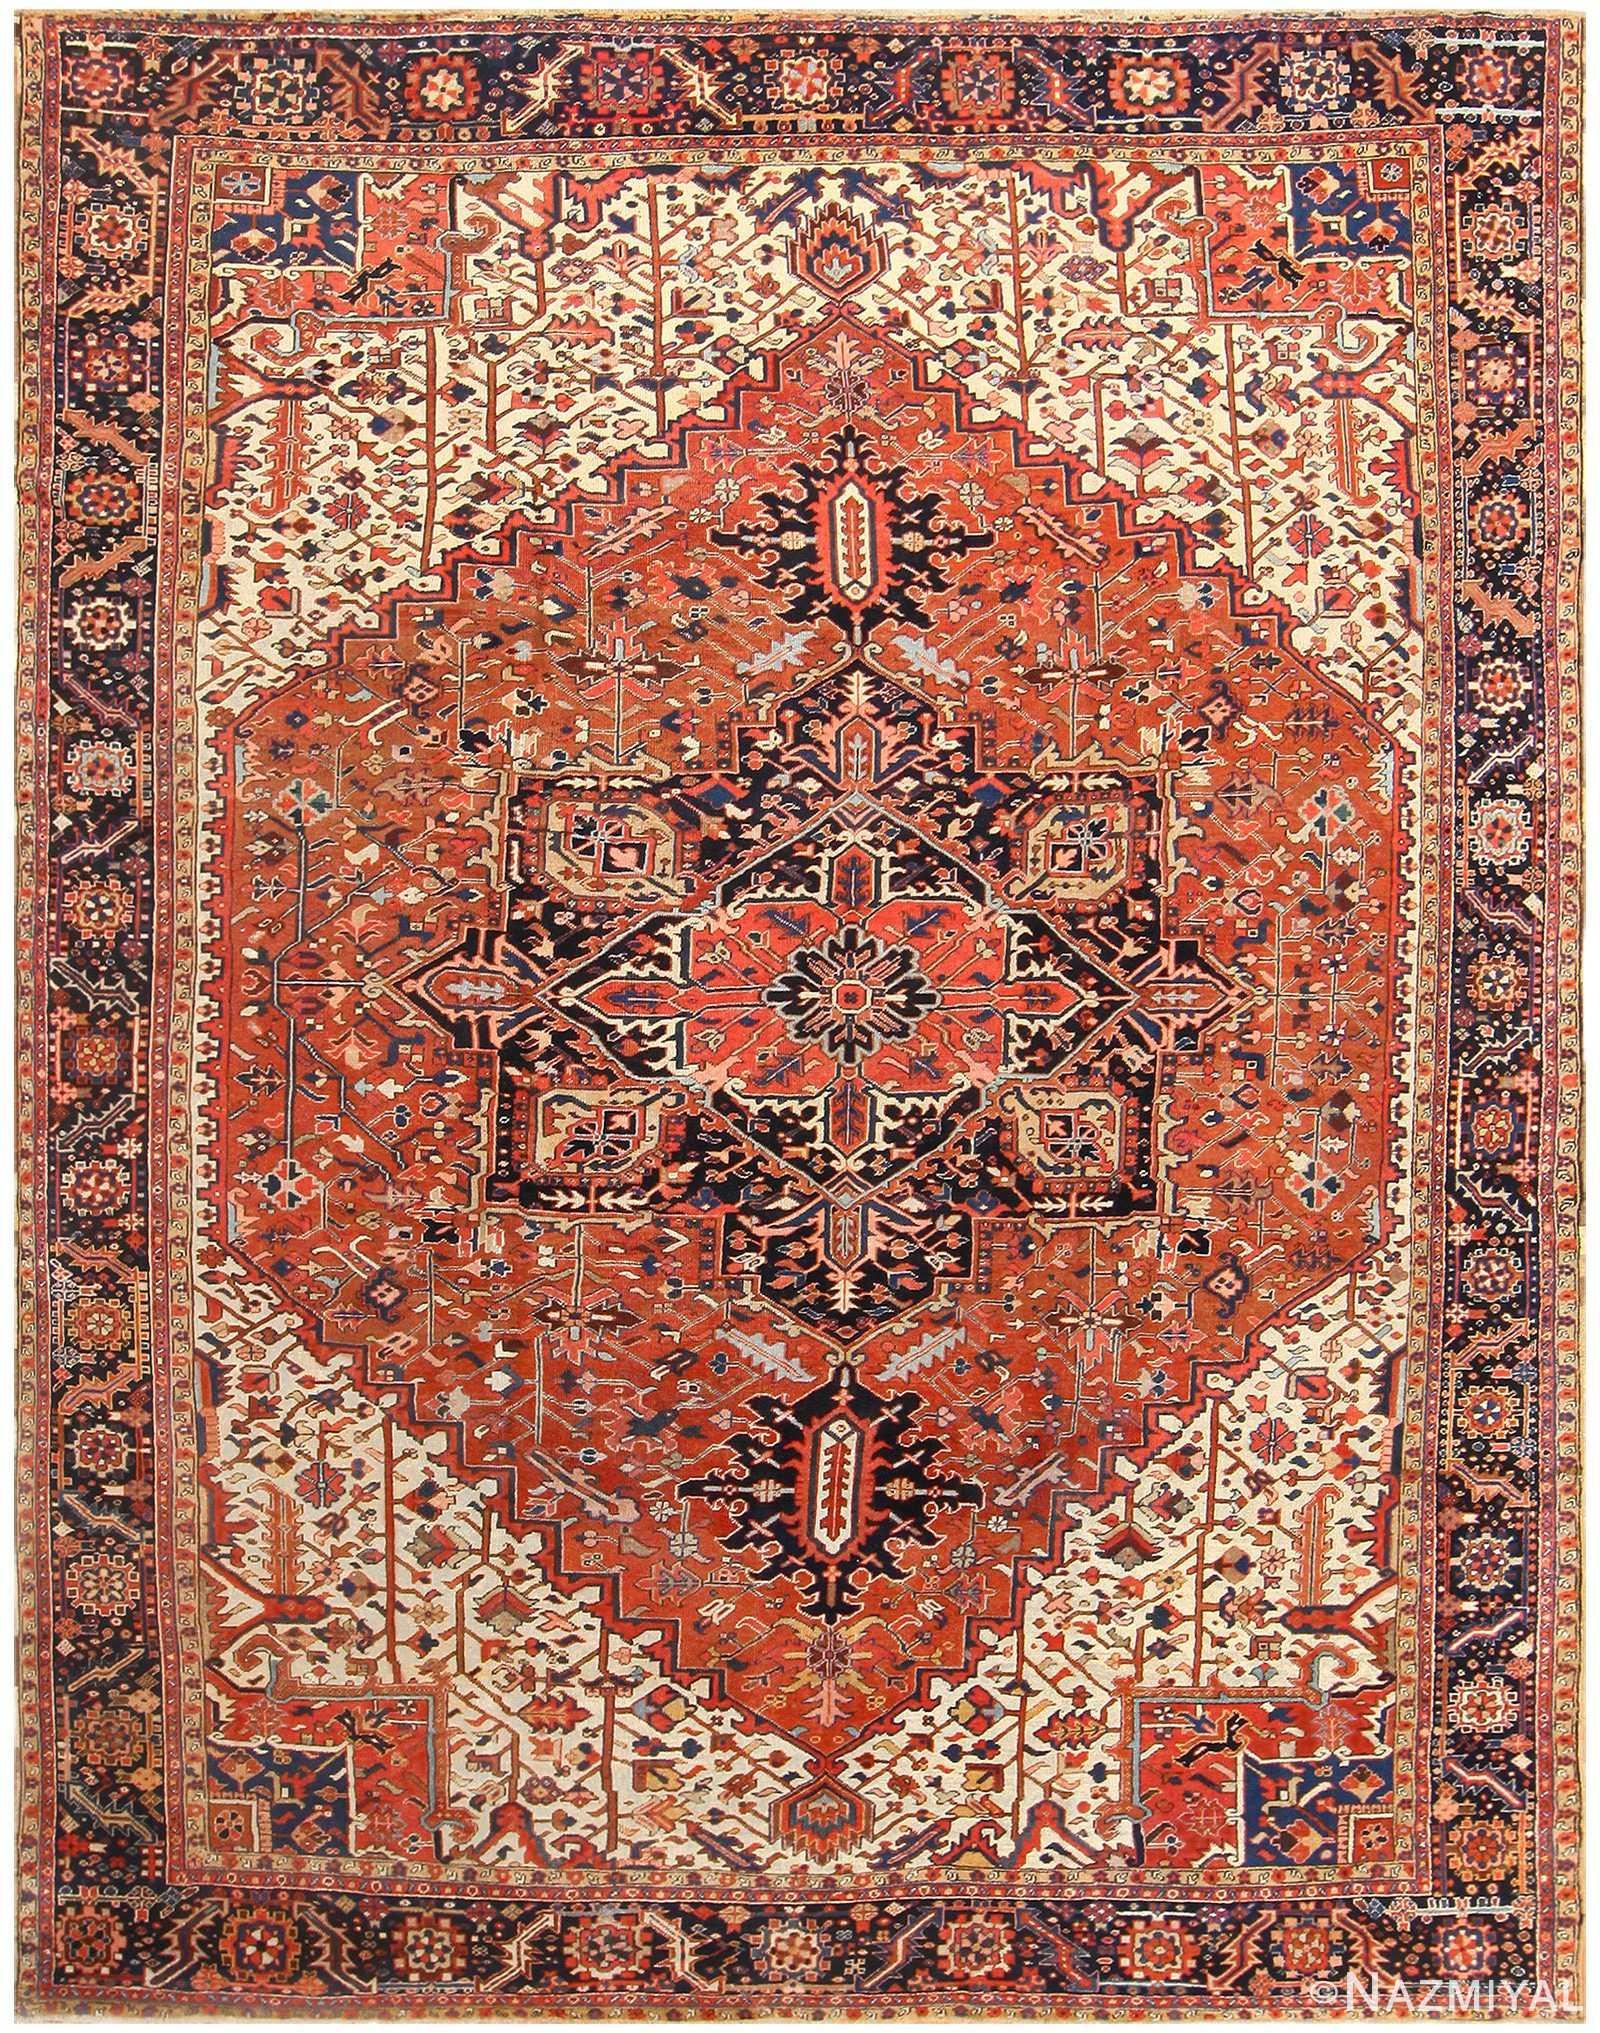 Antique Persian Heriz Rug 48318 Detail/Large View